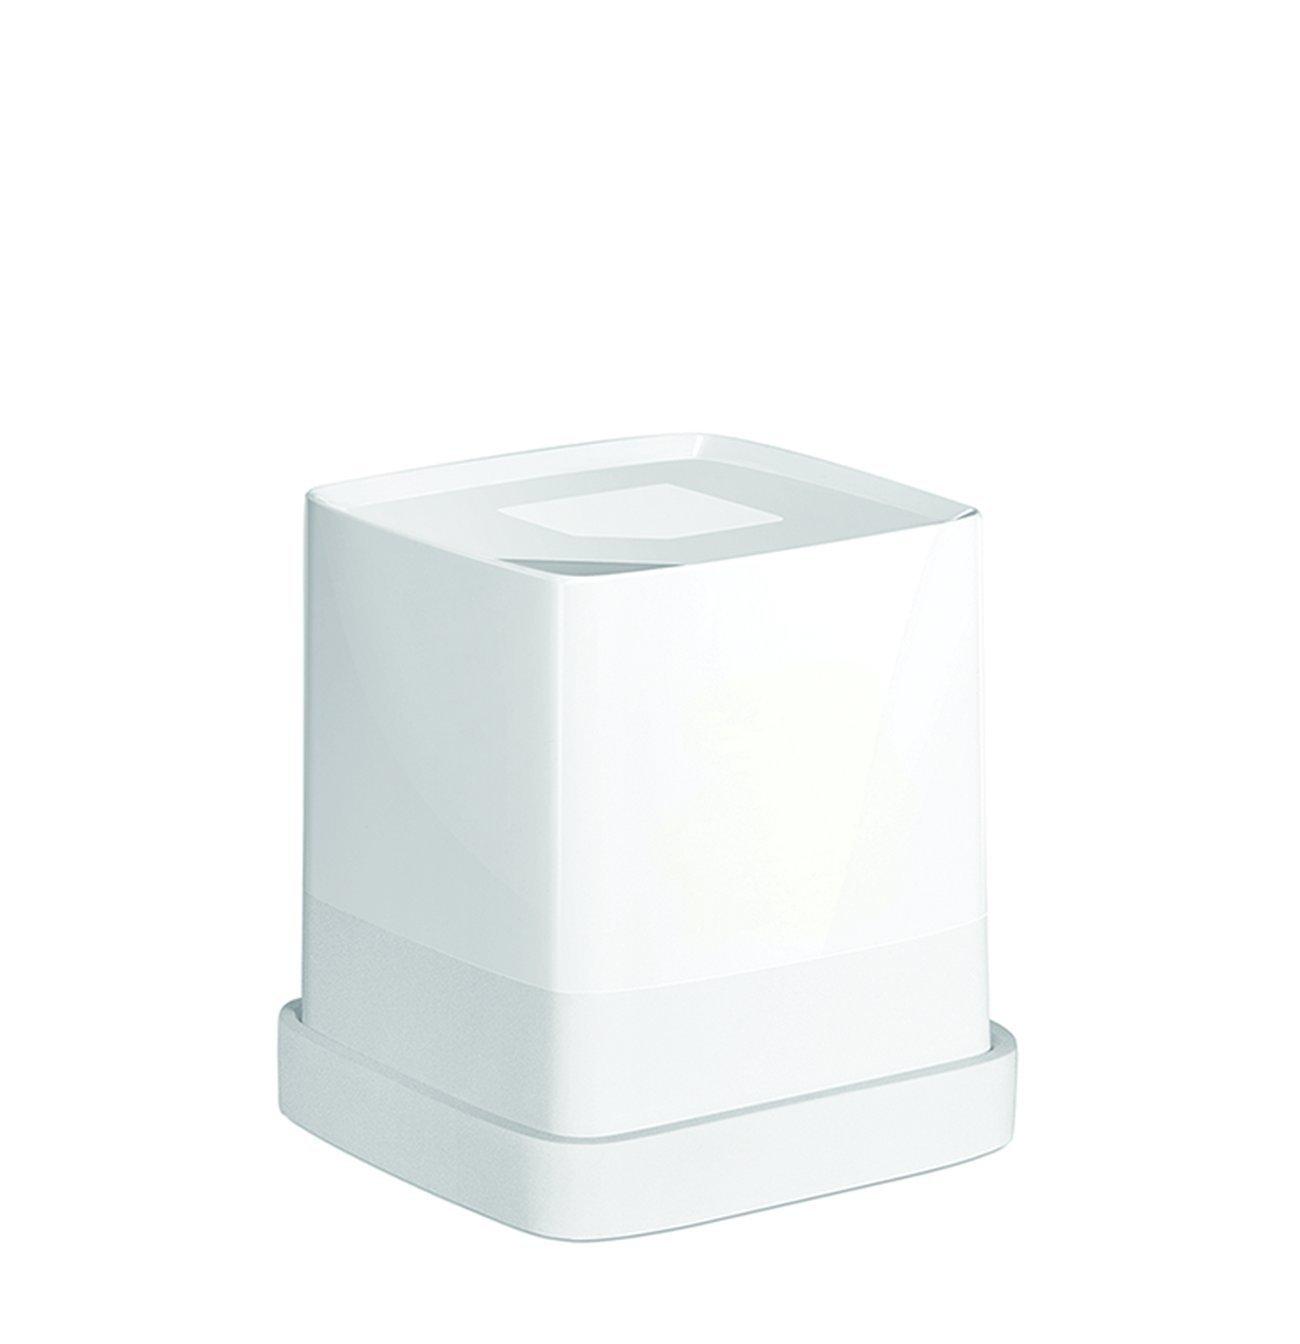 [Cube]-compressed